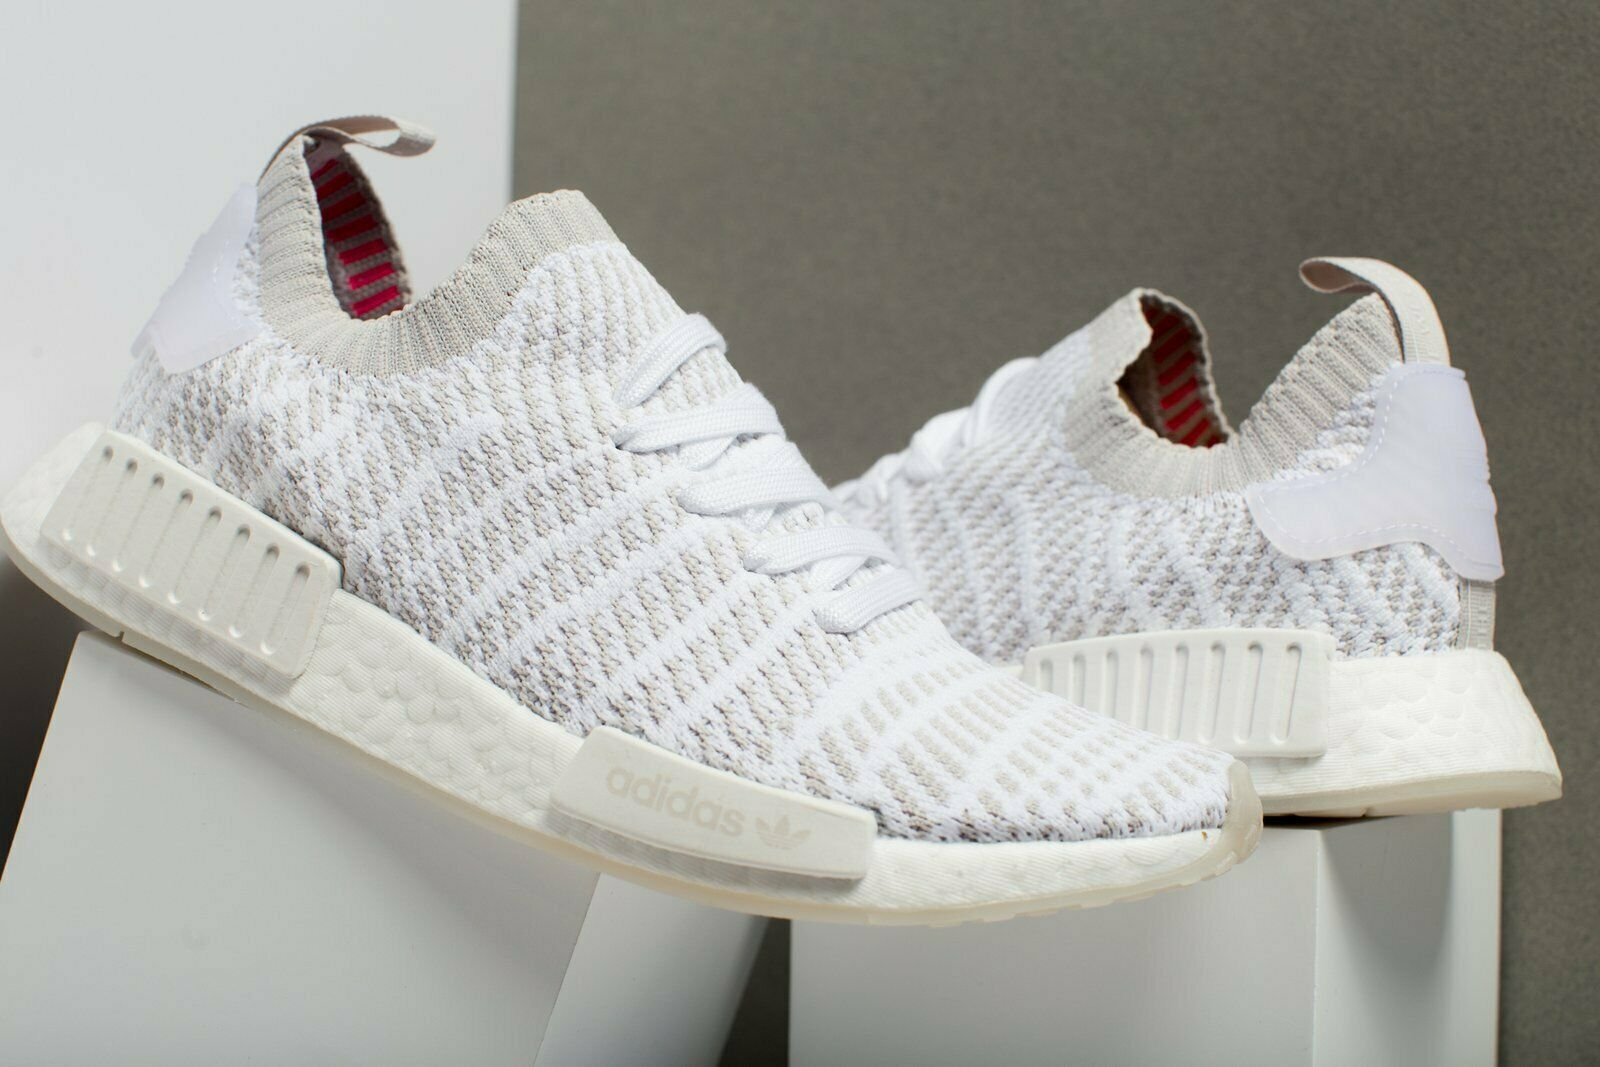 170 New Adidas NMD_R1 STLT Primeknit shoes Running Ahtletic Street White-Grey